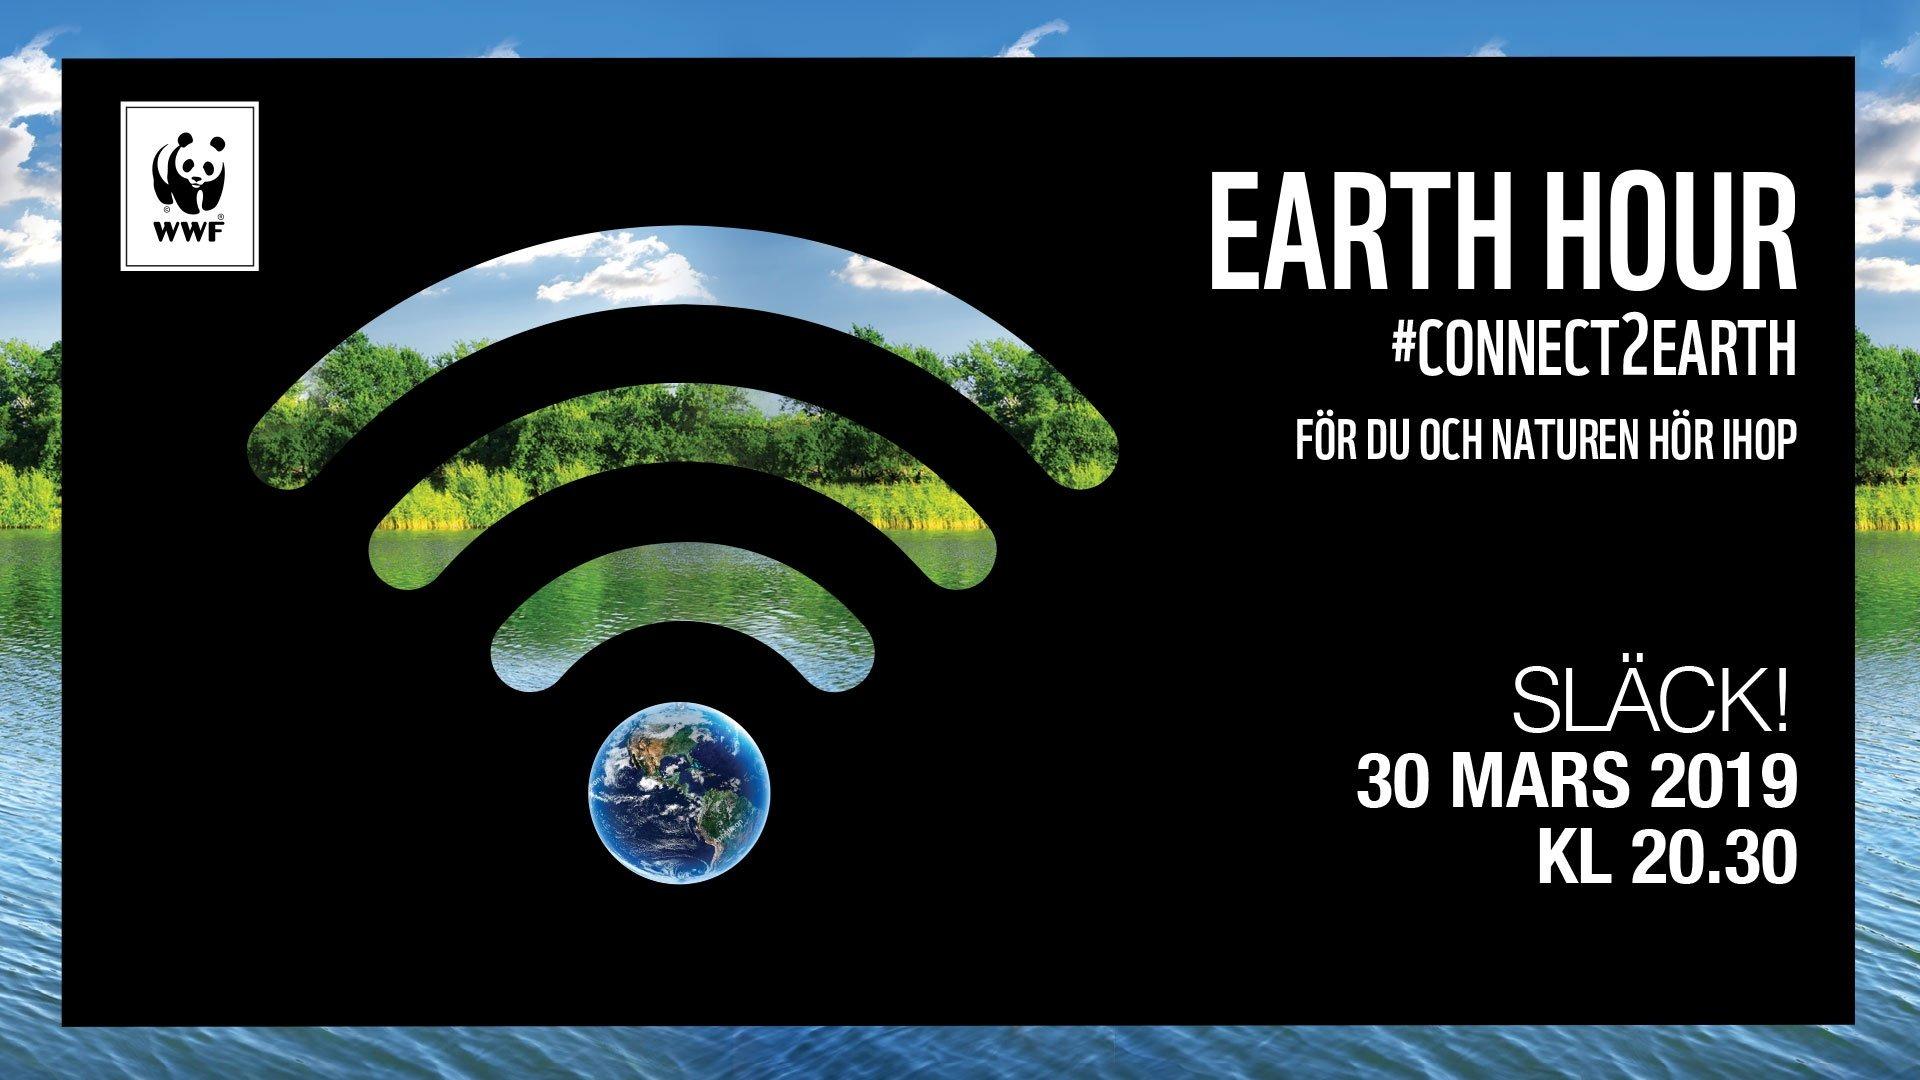 Earth hour 2019 - Bodens kommunutmanar dig